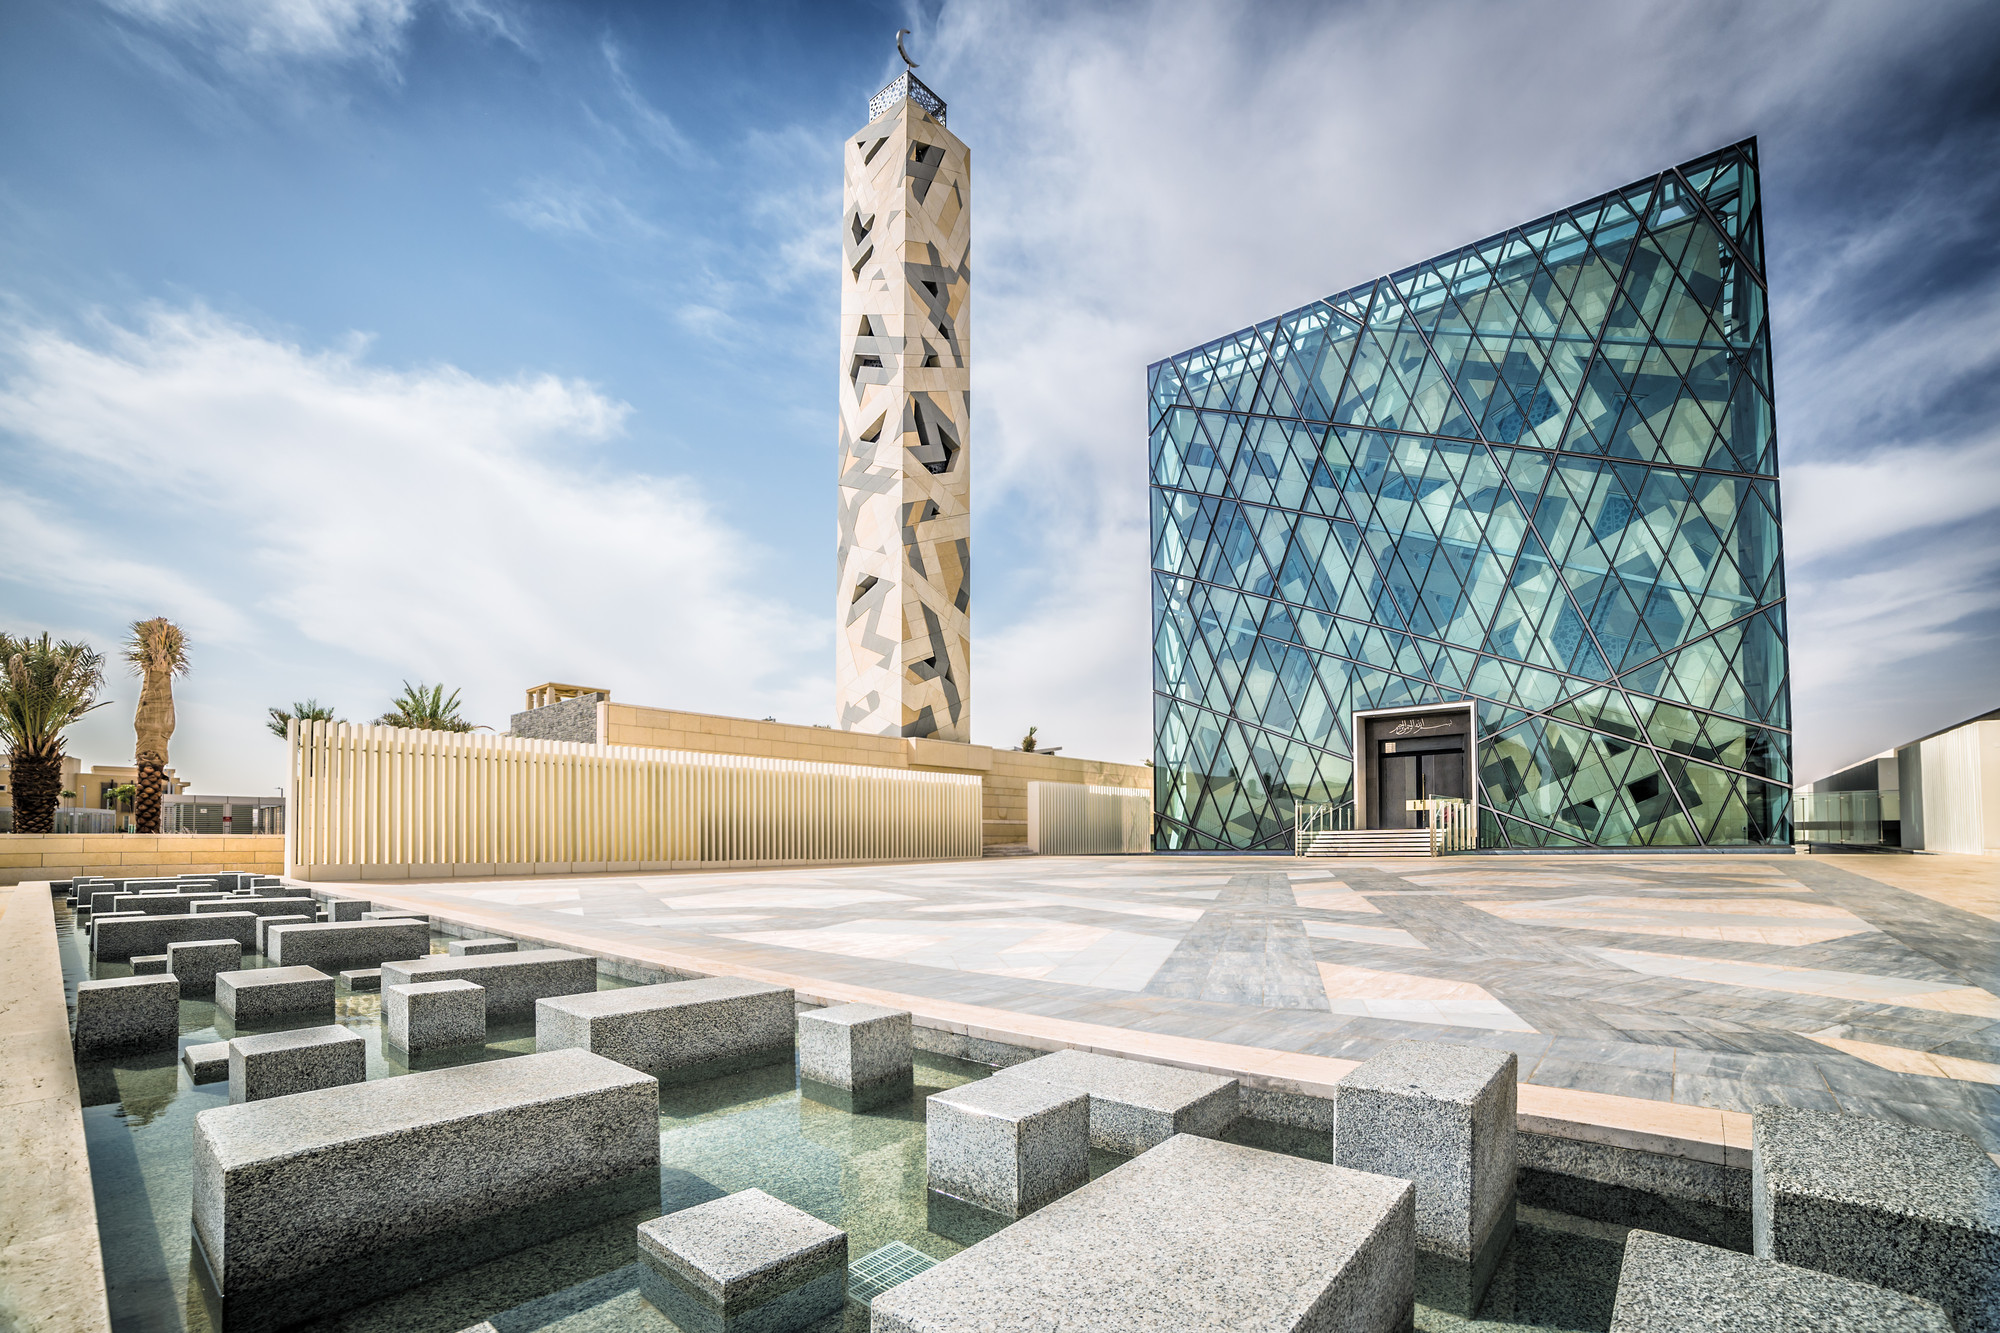 KAPSARC Mosque / HOK, © Abdulrahman Alolyan